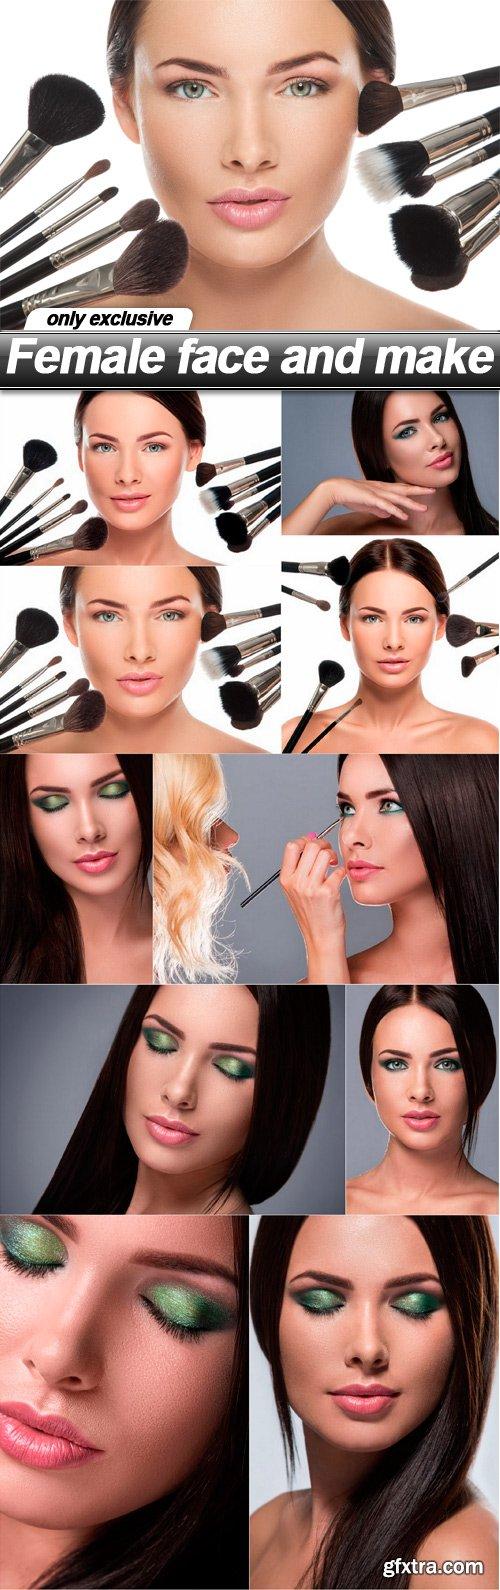 Female face and make - 10 UHQ JPEG